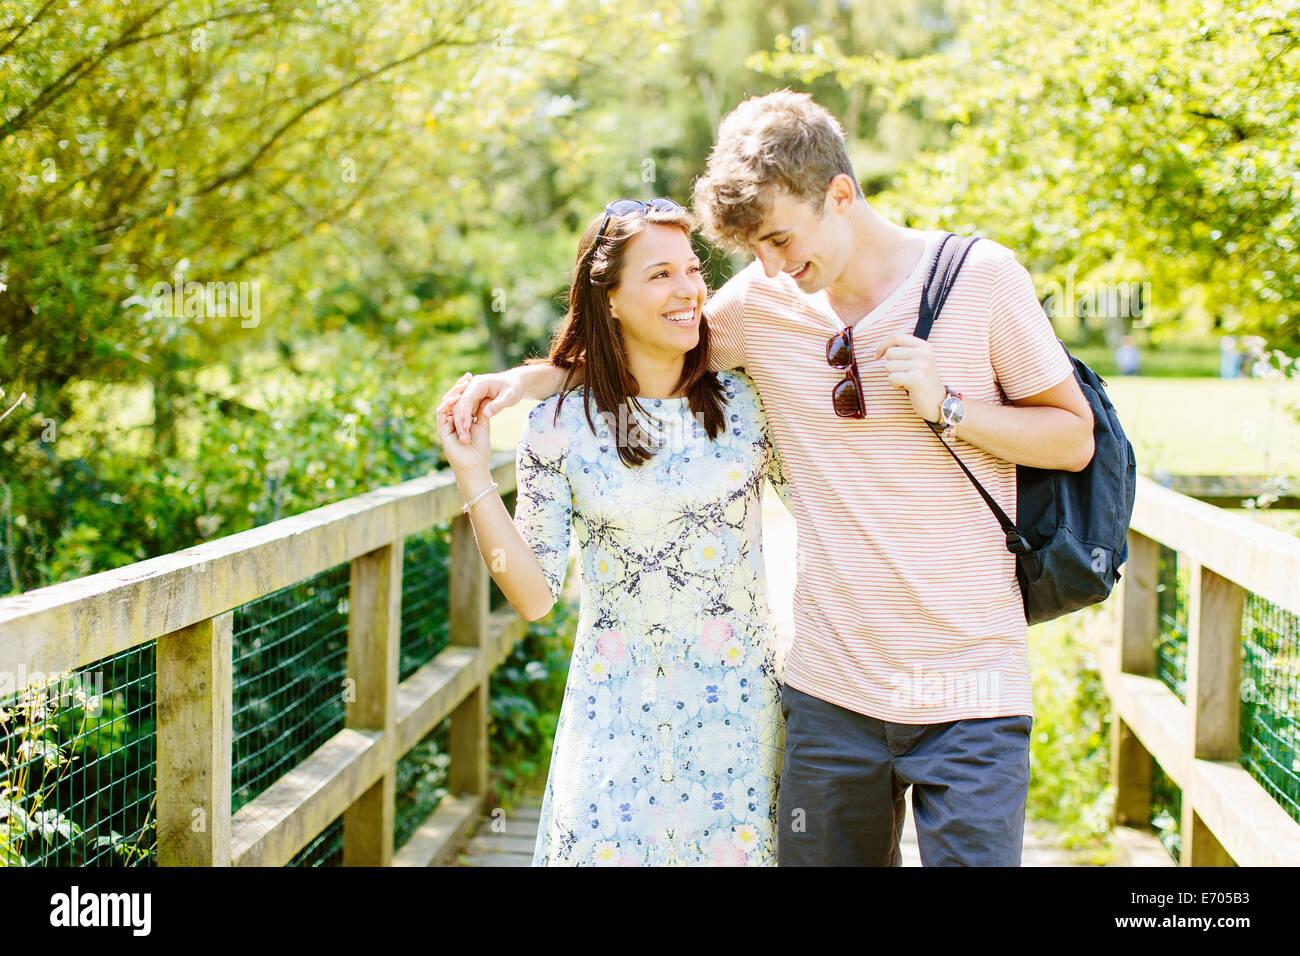 Couple walking over wooden bridge in the park Stock Photo